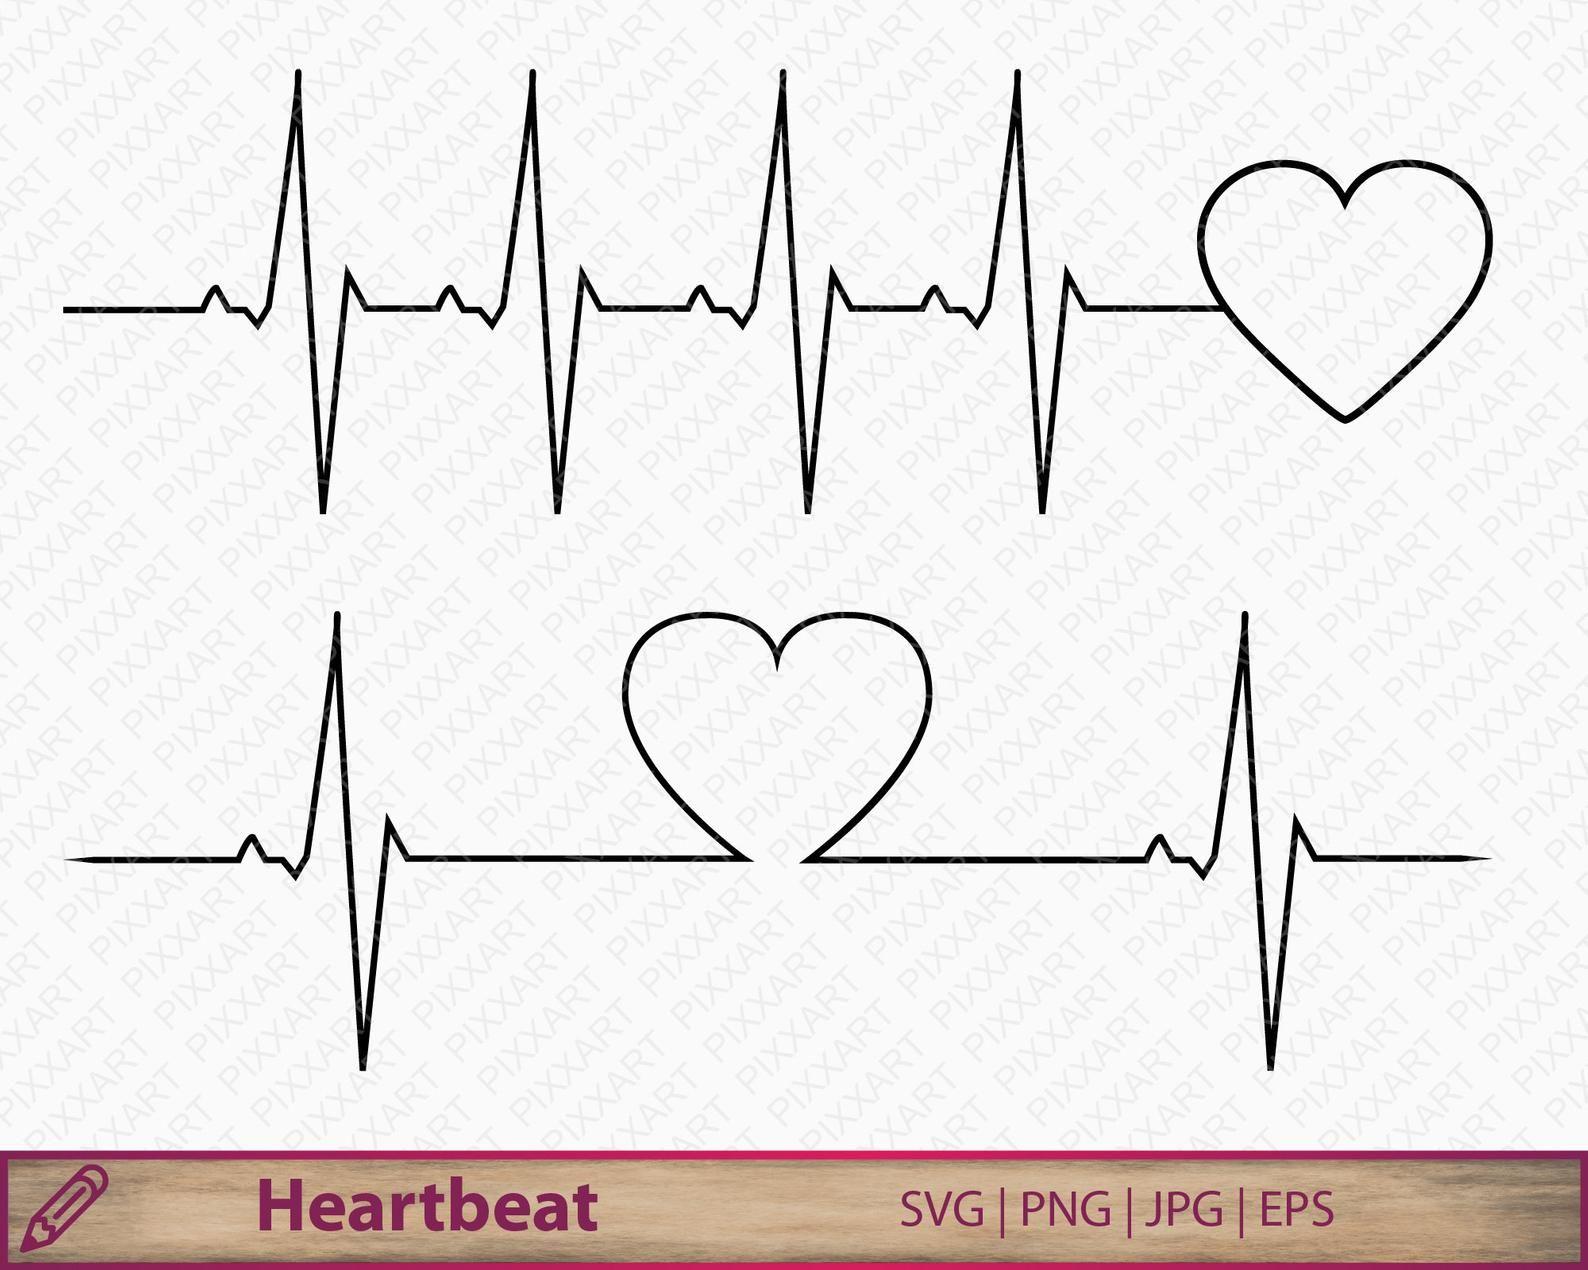 Heartbeat Svg Dxf Png Love Clipart Love Life Medical Etsy Tatuagem Tatuagem Inspiradora Tatoo